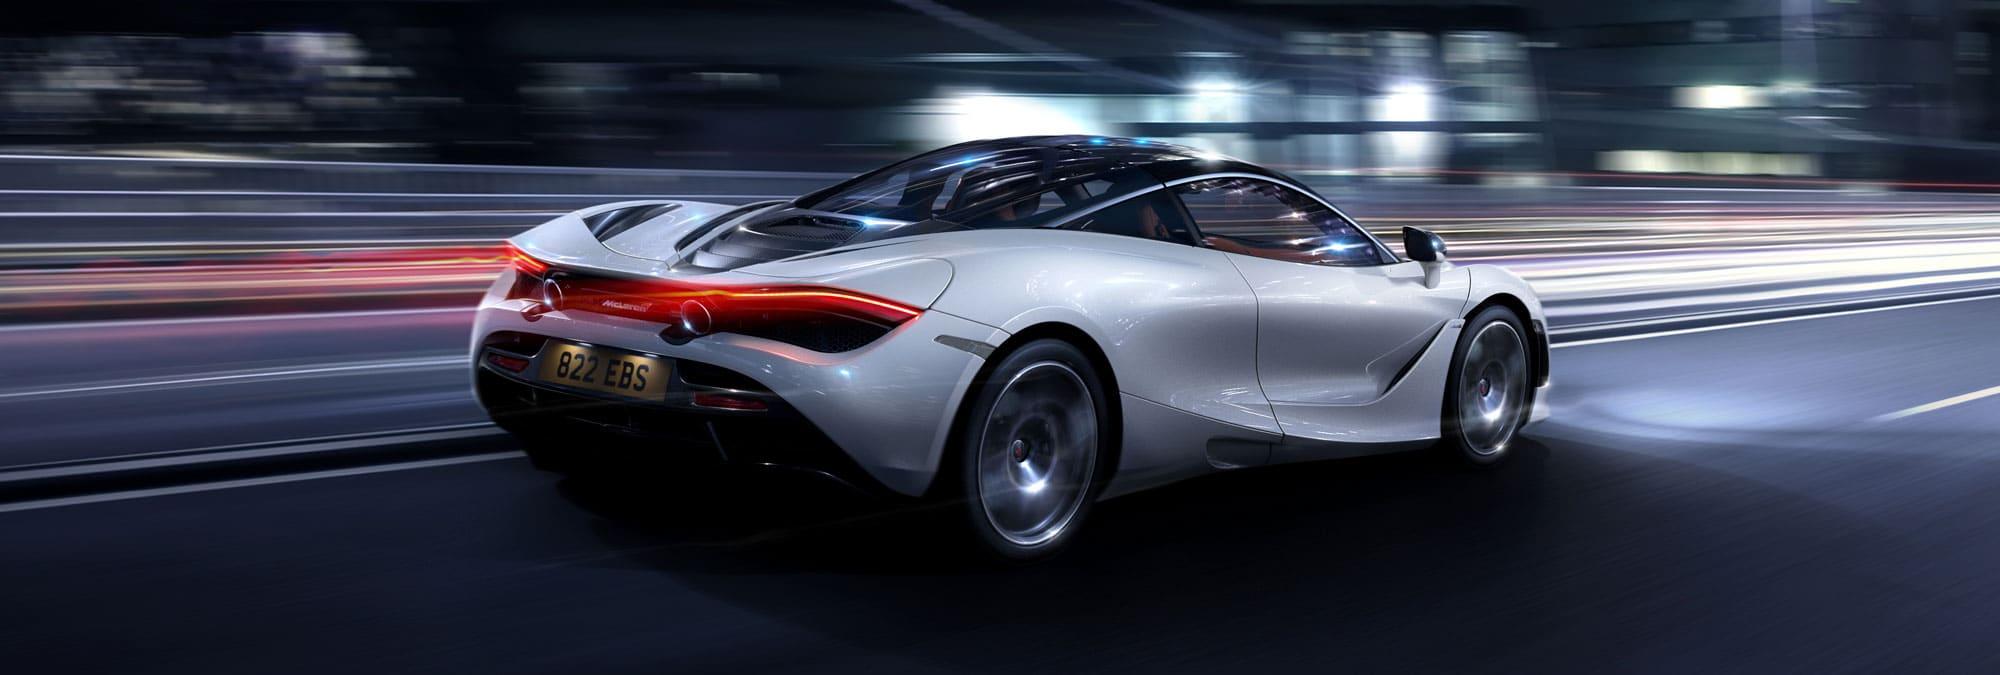 mclaren-720s-white-for-sale-rear-3quarter-road-taillights-blur-hero